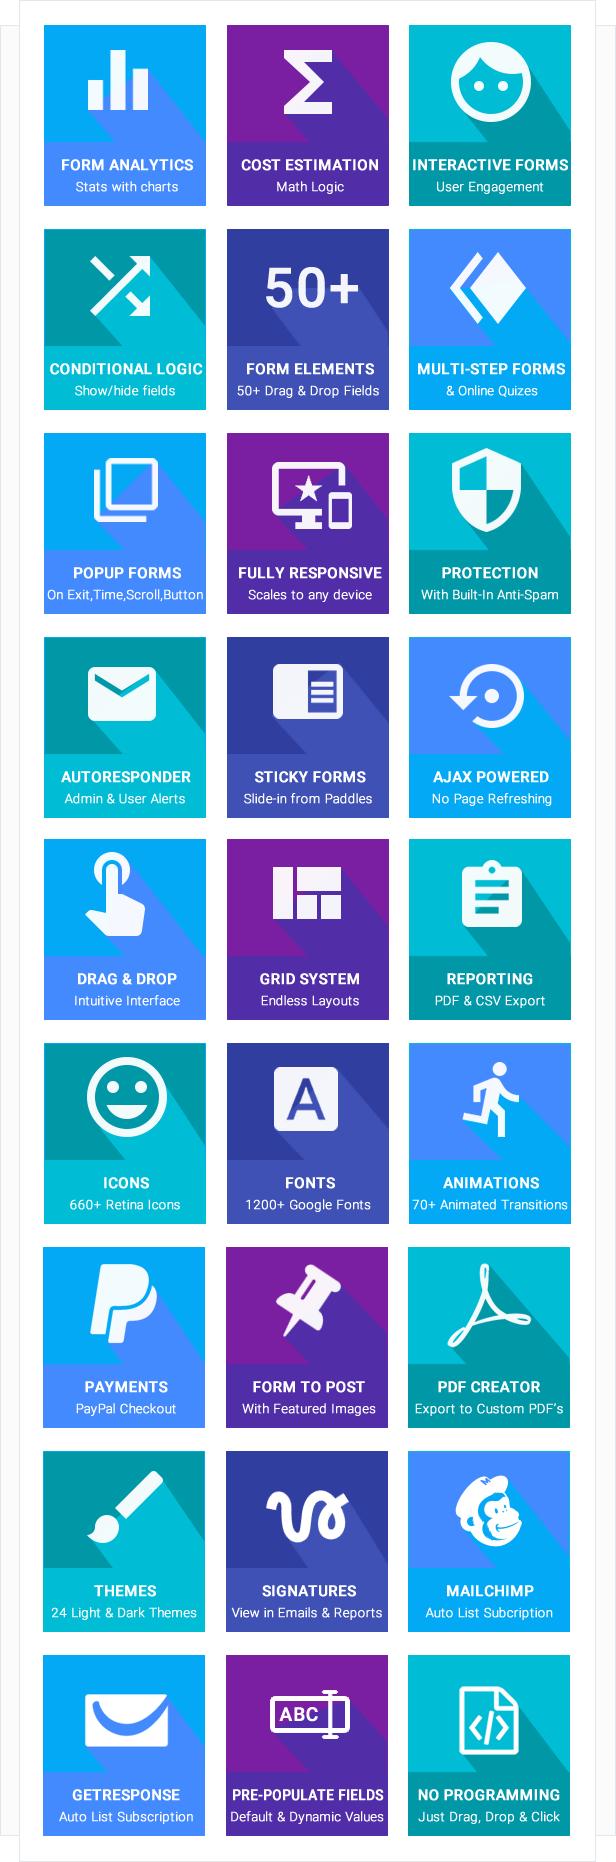 NEX-Forms - Der ultimative WordPress Formular-Generator - Overall Key Features